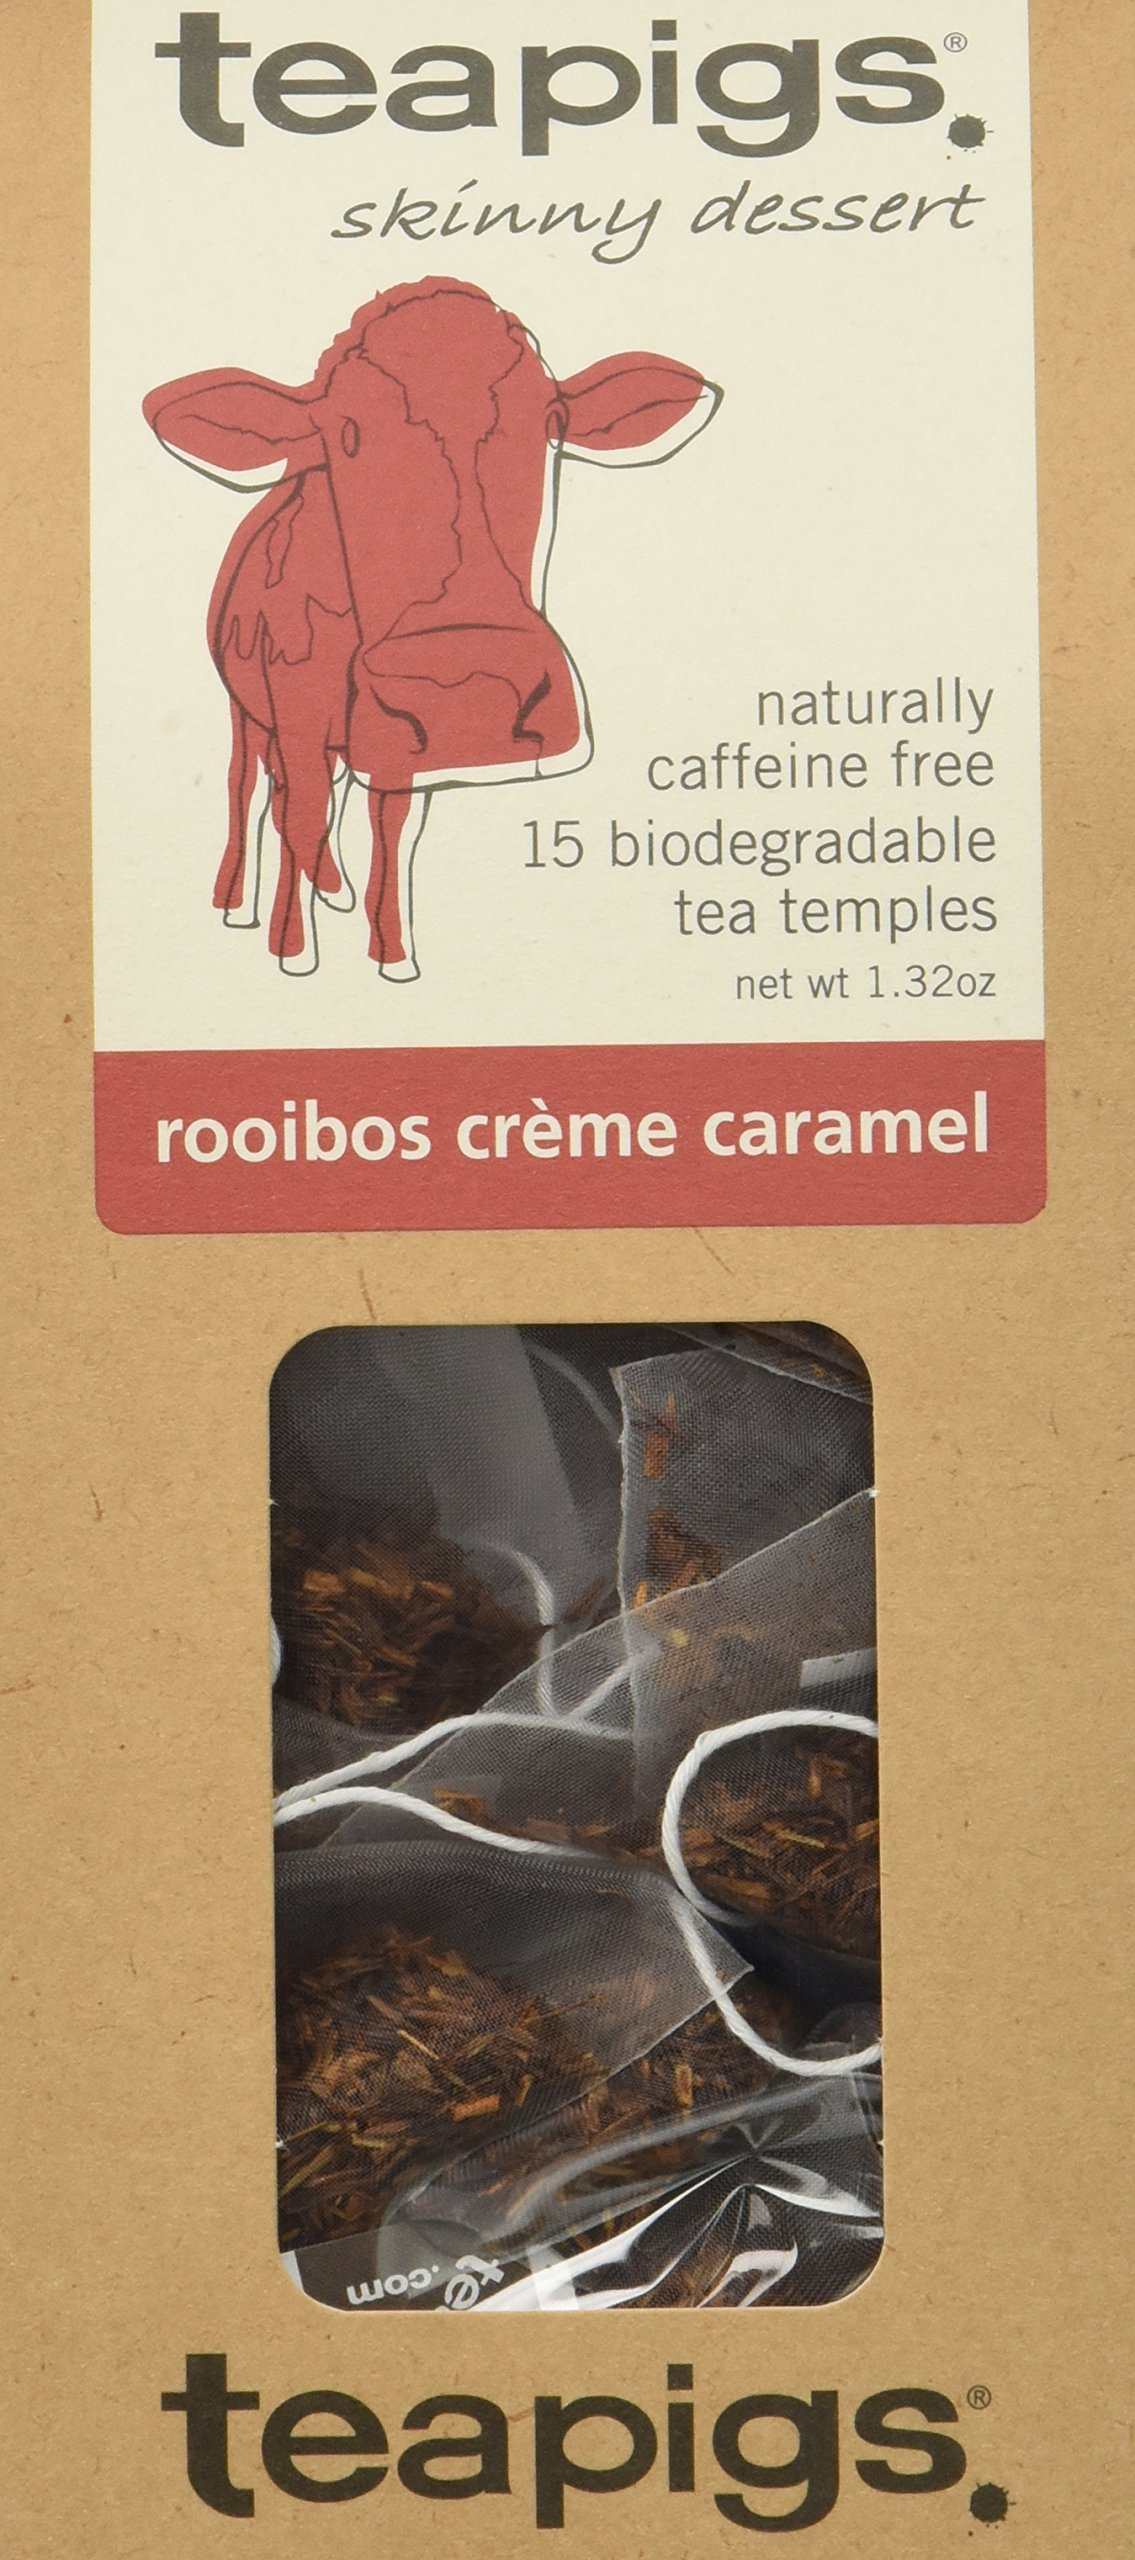 teapigs Rooibos Creme Caramel Tea, 15 Count, 1.32 Oz, (Pack of 6)